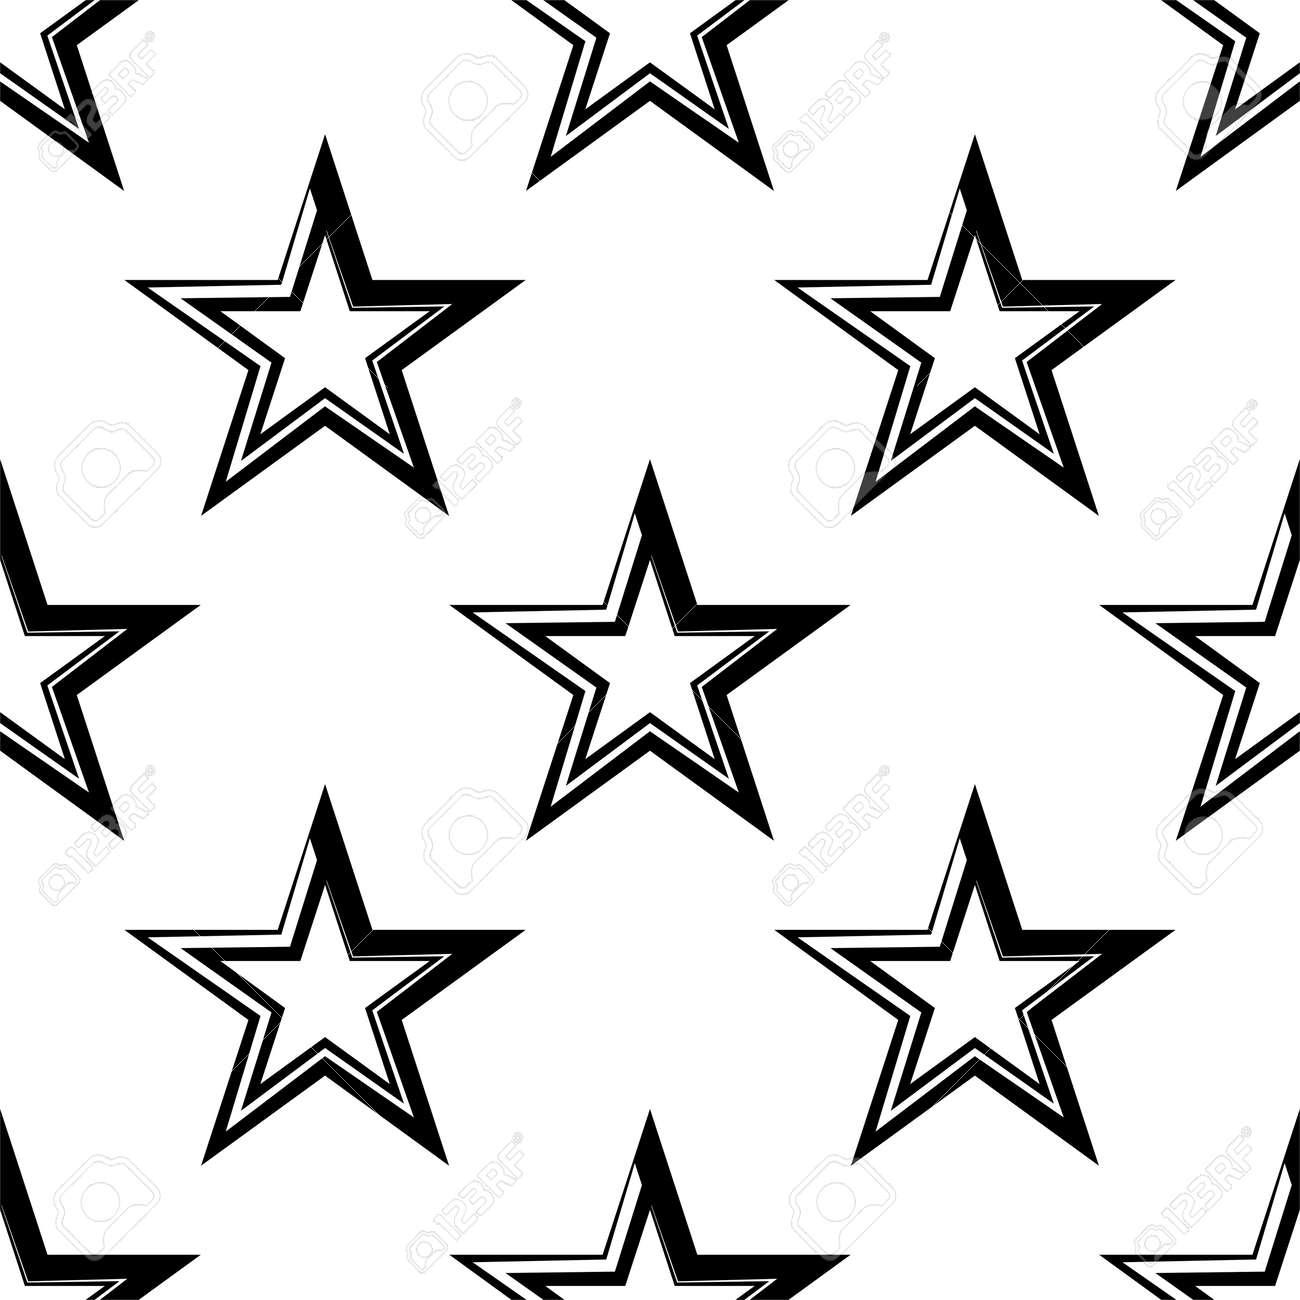 Star Shape Icon Seamless Pattern Vector Art Illustration - 149571111